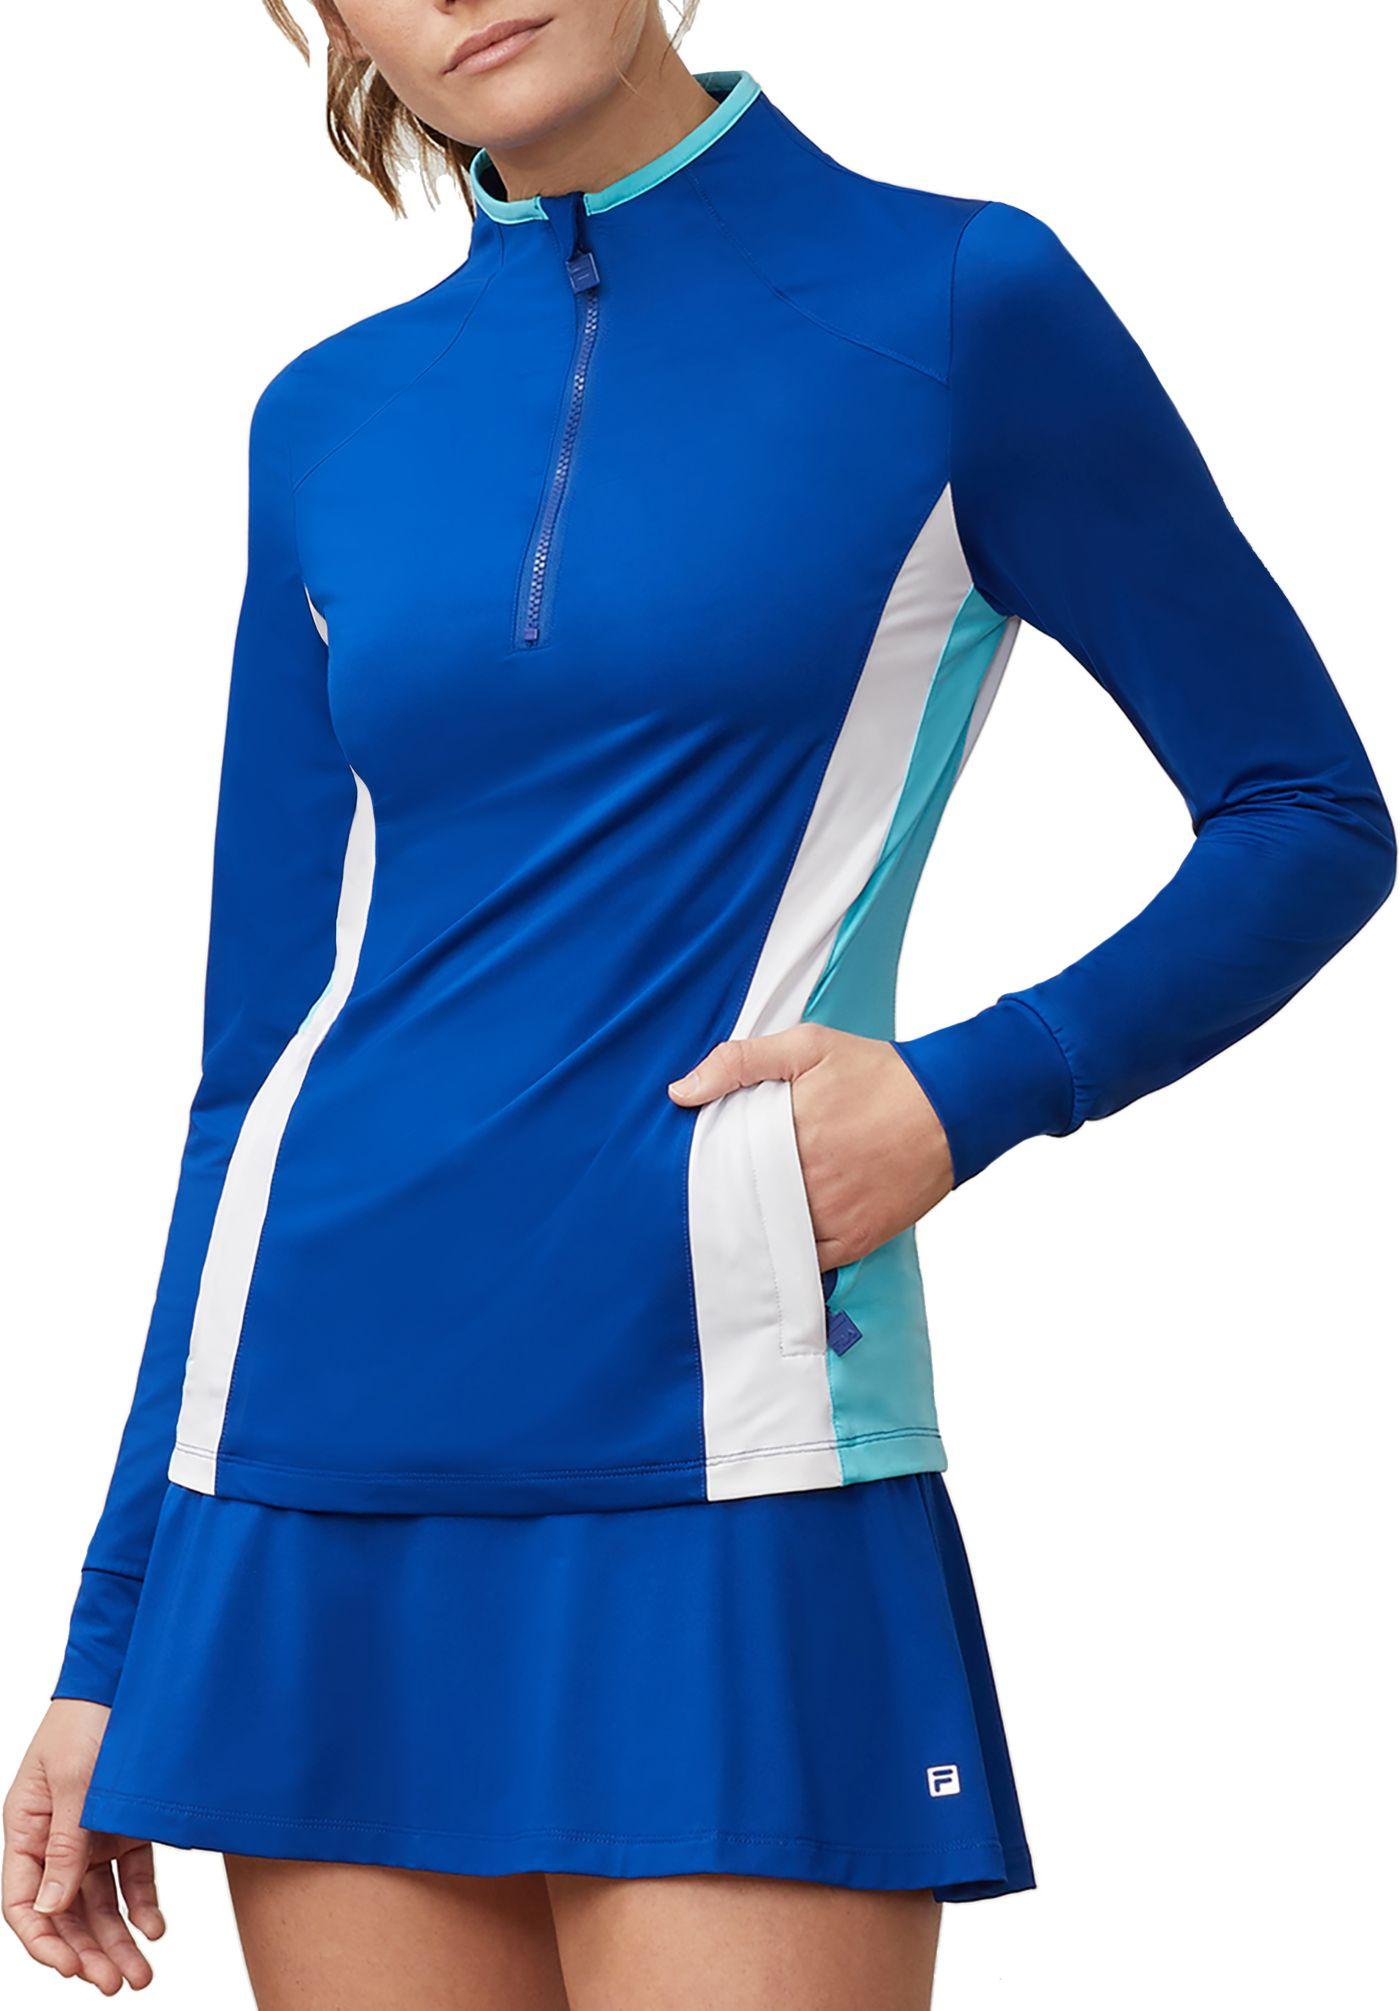 Fila Women's Aqua Sole Half Zip Tennis Jacket